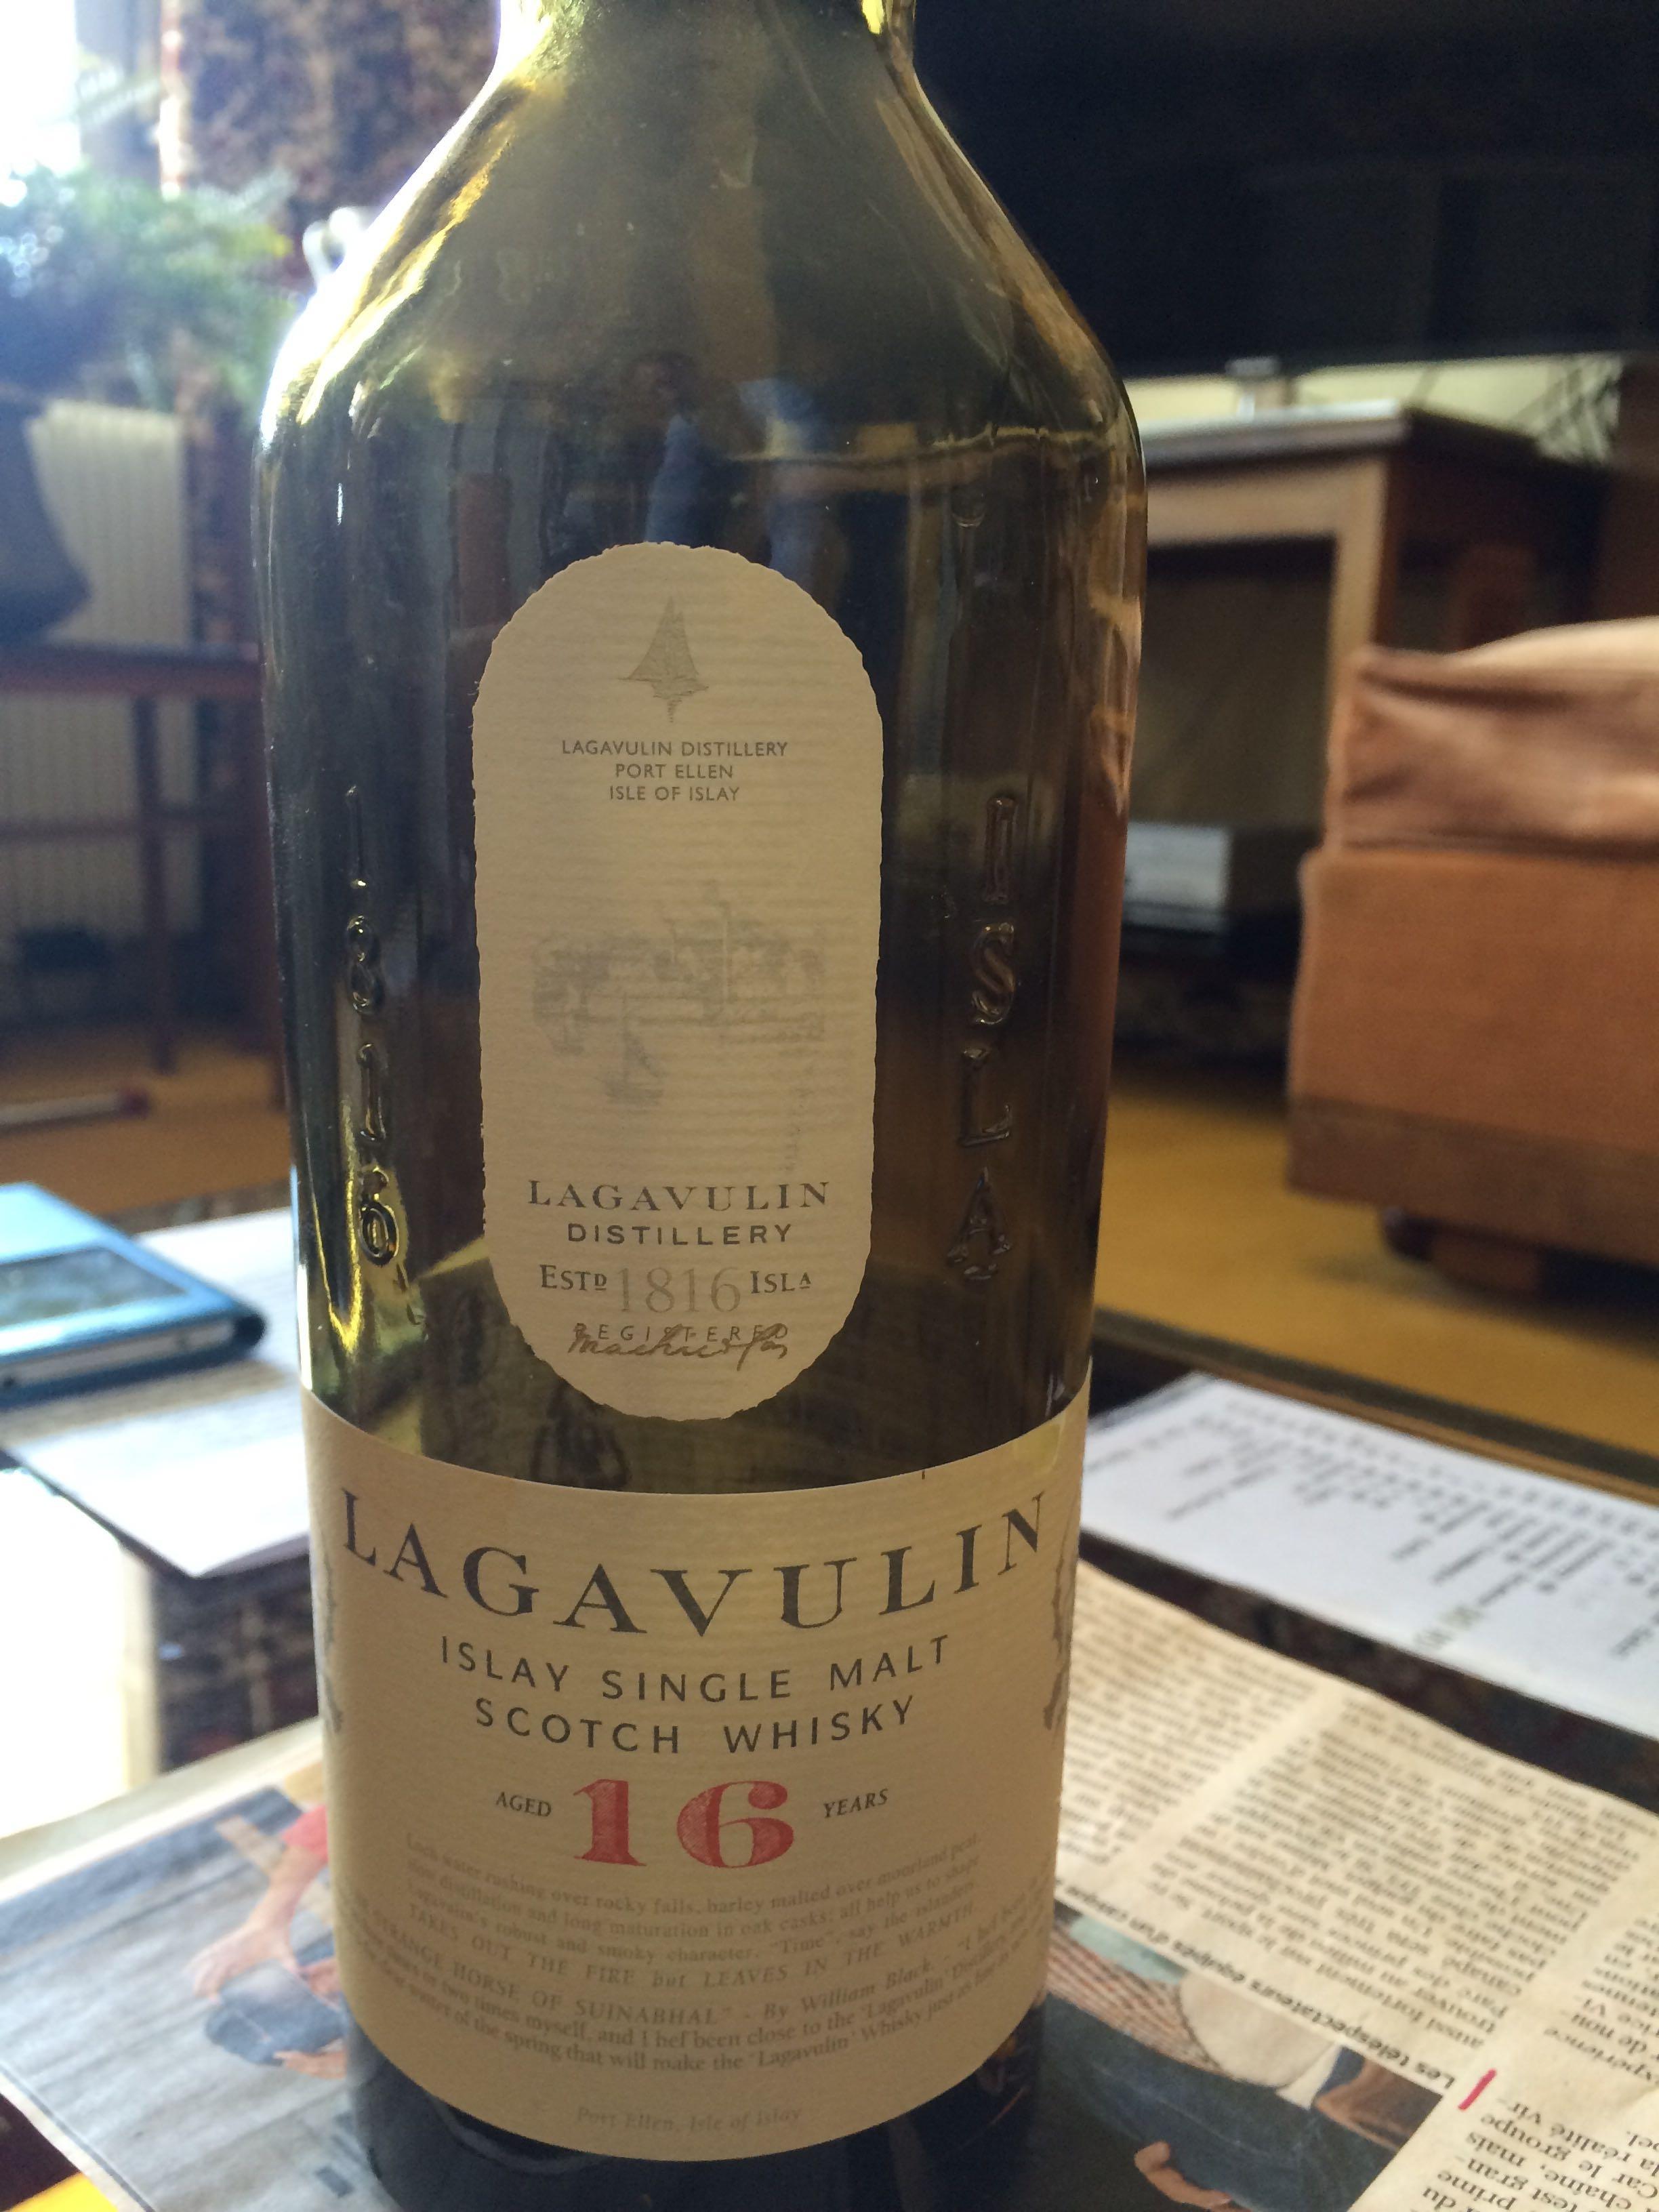 Lagavulin Single Malt Islay Scotch Whisky - Product